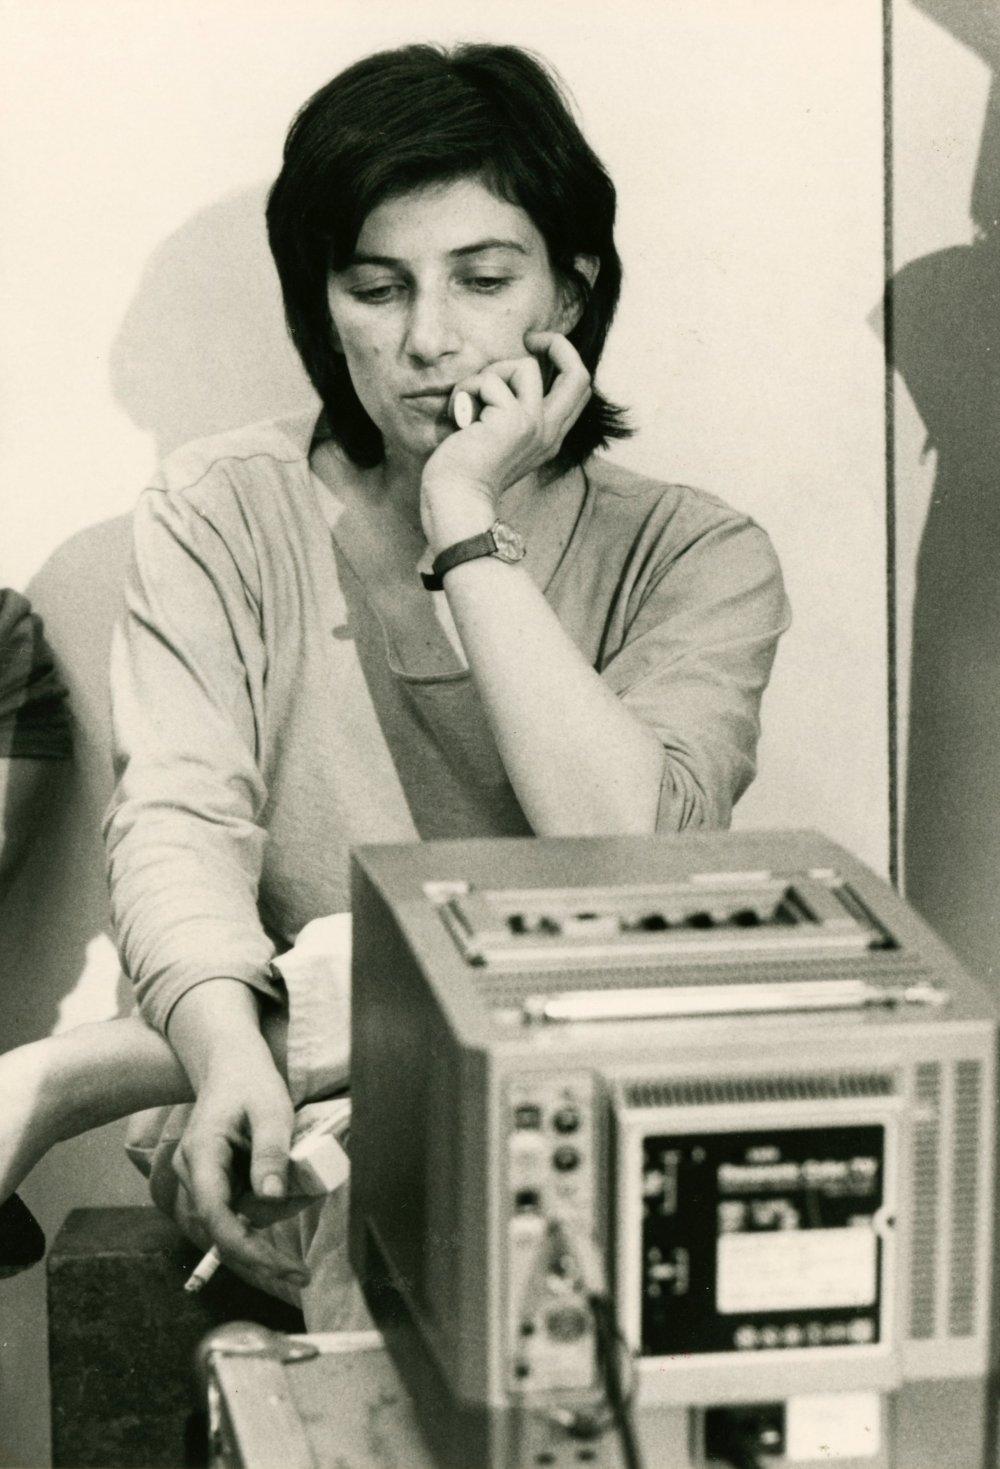 Hall of Fame: In memoriam Chantal Akerman